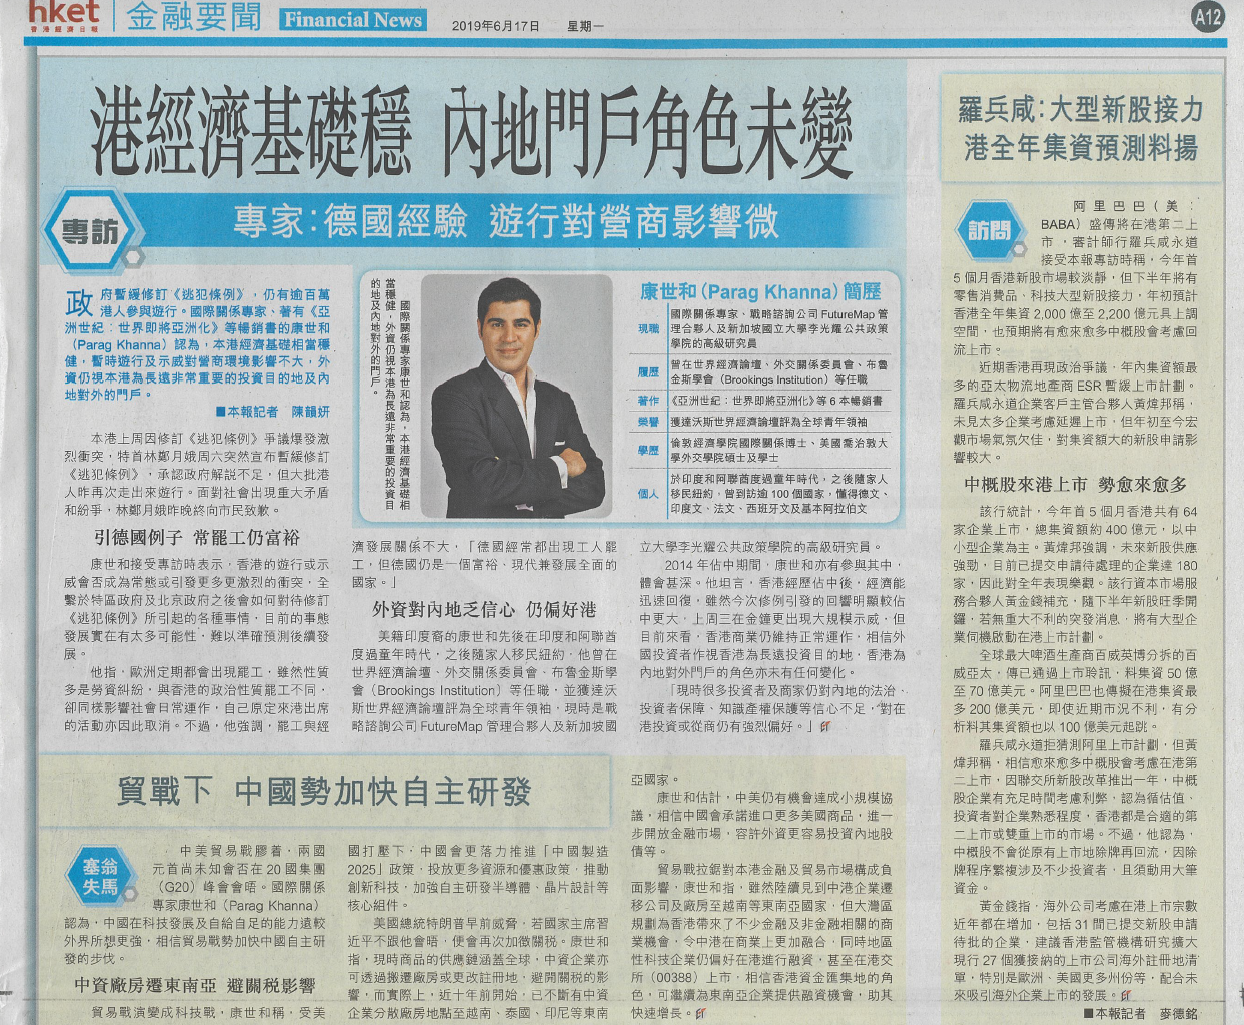 20190617 - Hong Kong Economic Times - Hong Kong's Economy Is Stable_ Hong Kong's Gateway Role Remains Unchanged.png